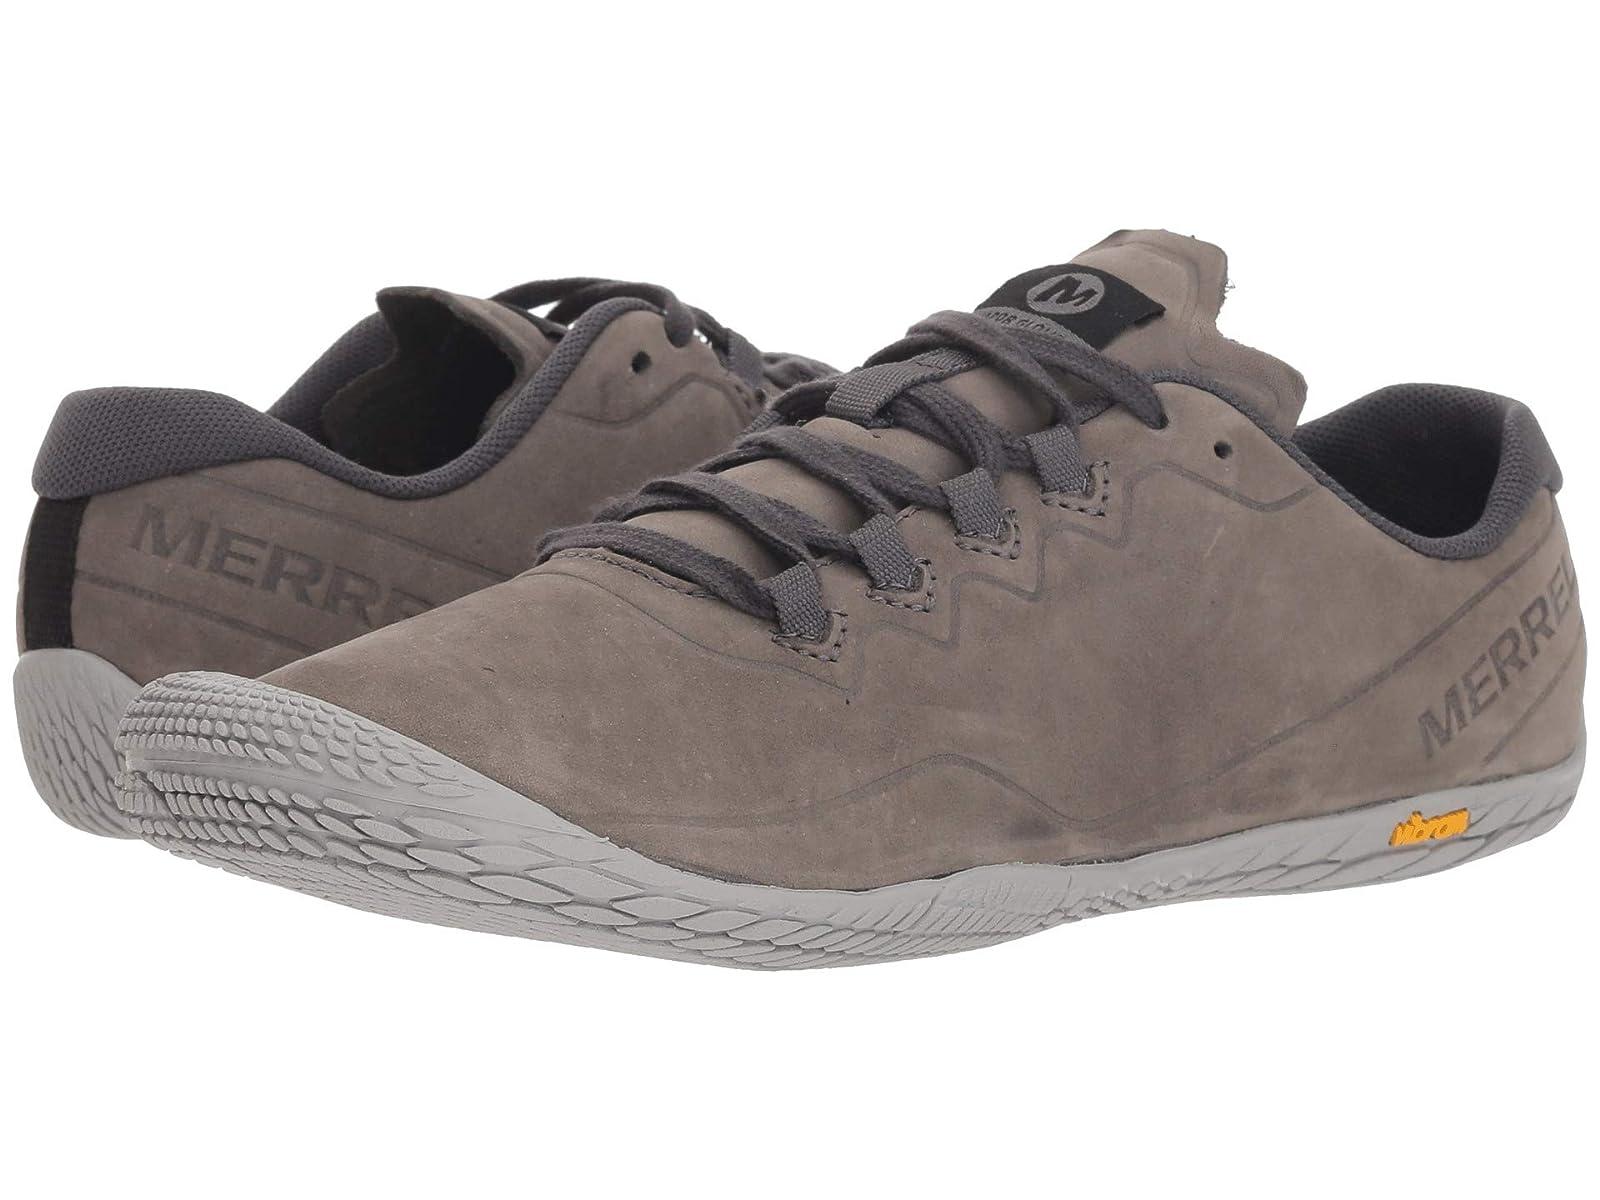 Merrell Vapor Glove 3 Luna LeatherAtmospheric grades have affordable shoes